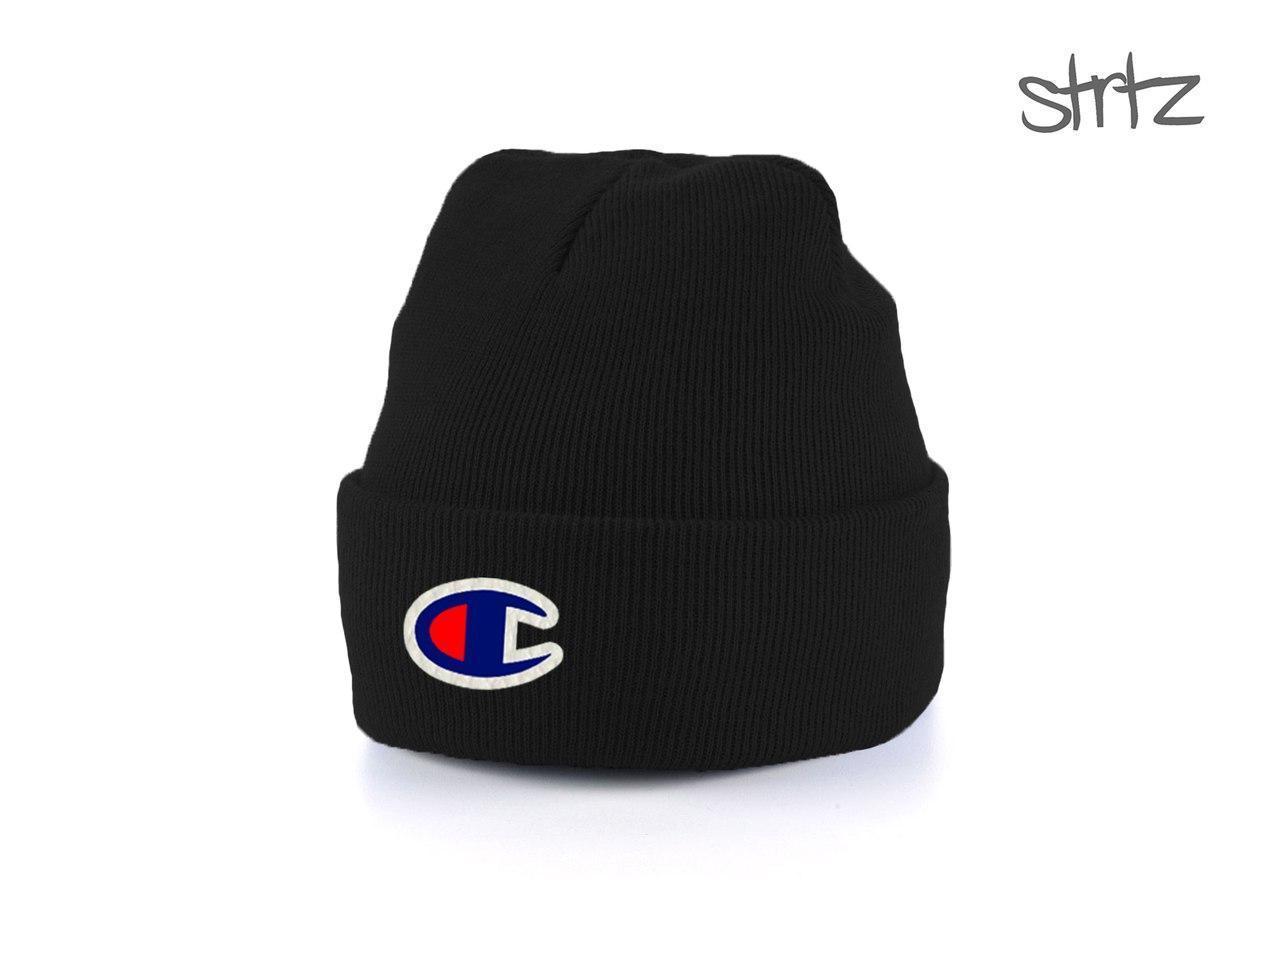 Модная мужская шапка чемпион, шапка Champion